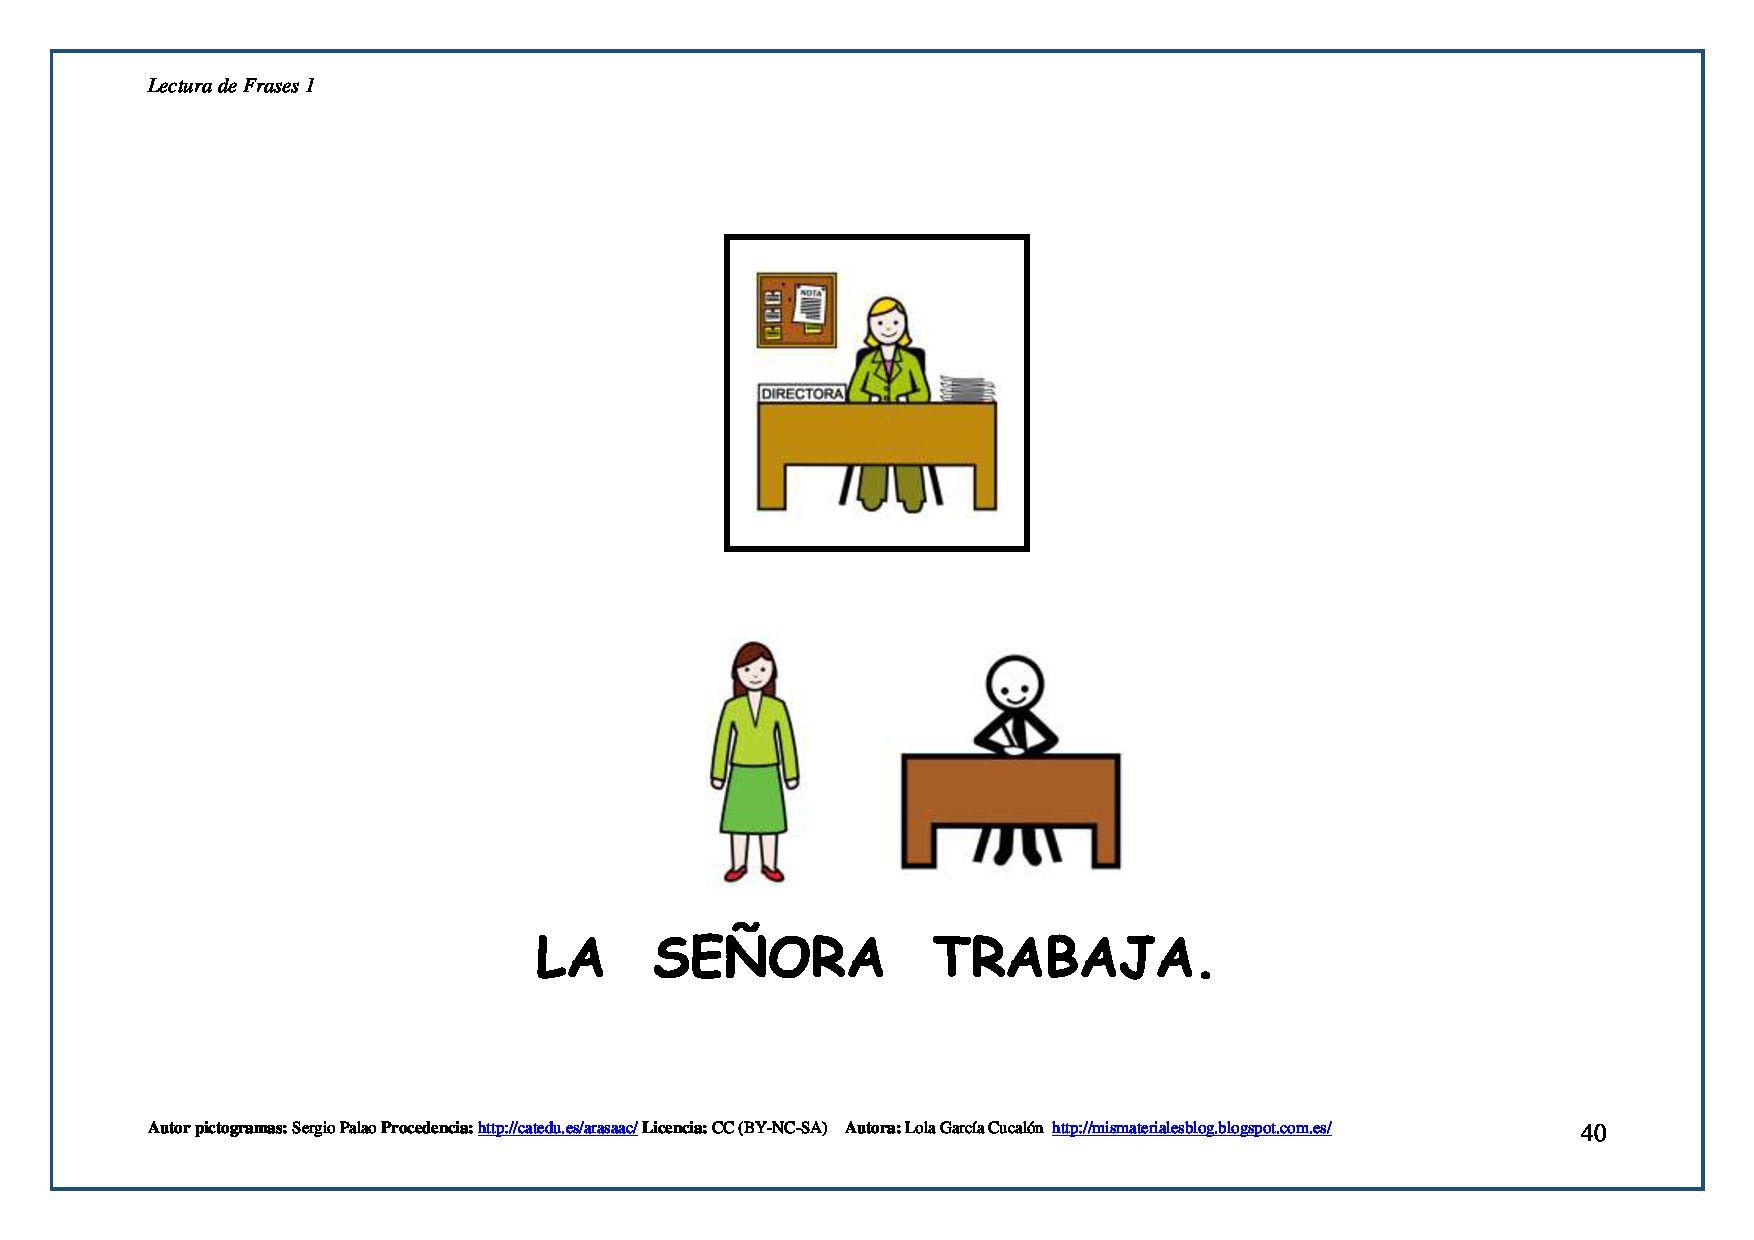 ARASAAC - Materiales: Libros de lectura de frases en mayúsculas ...